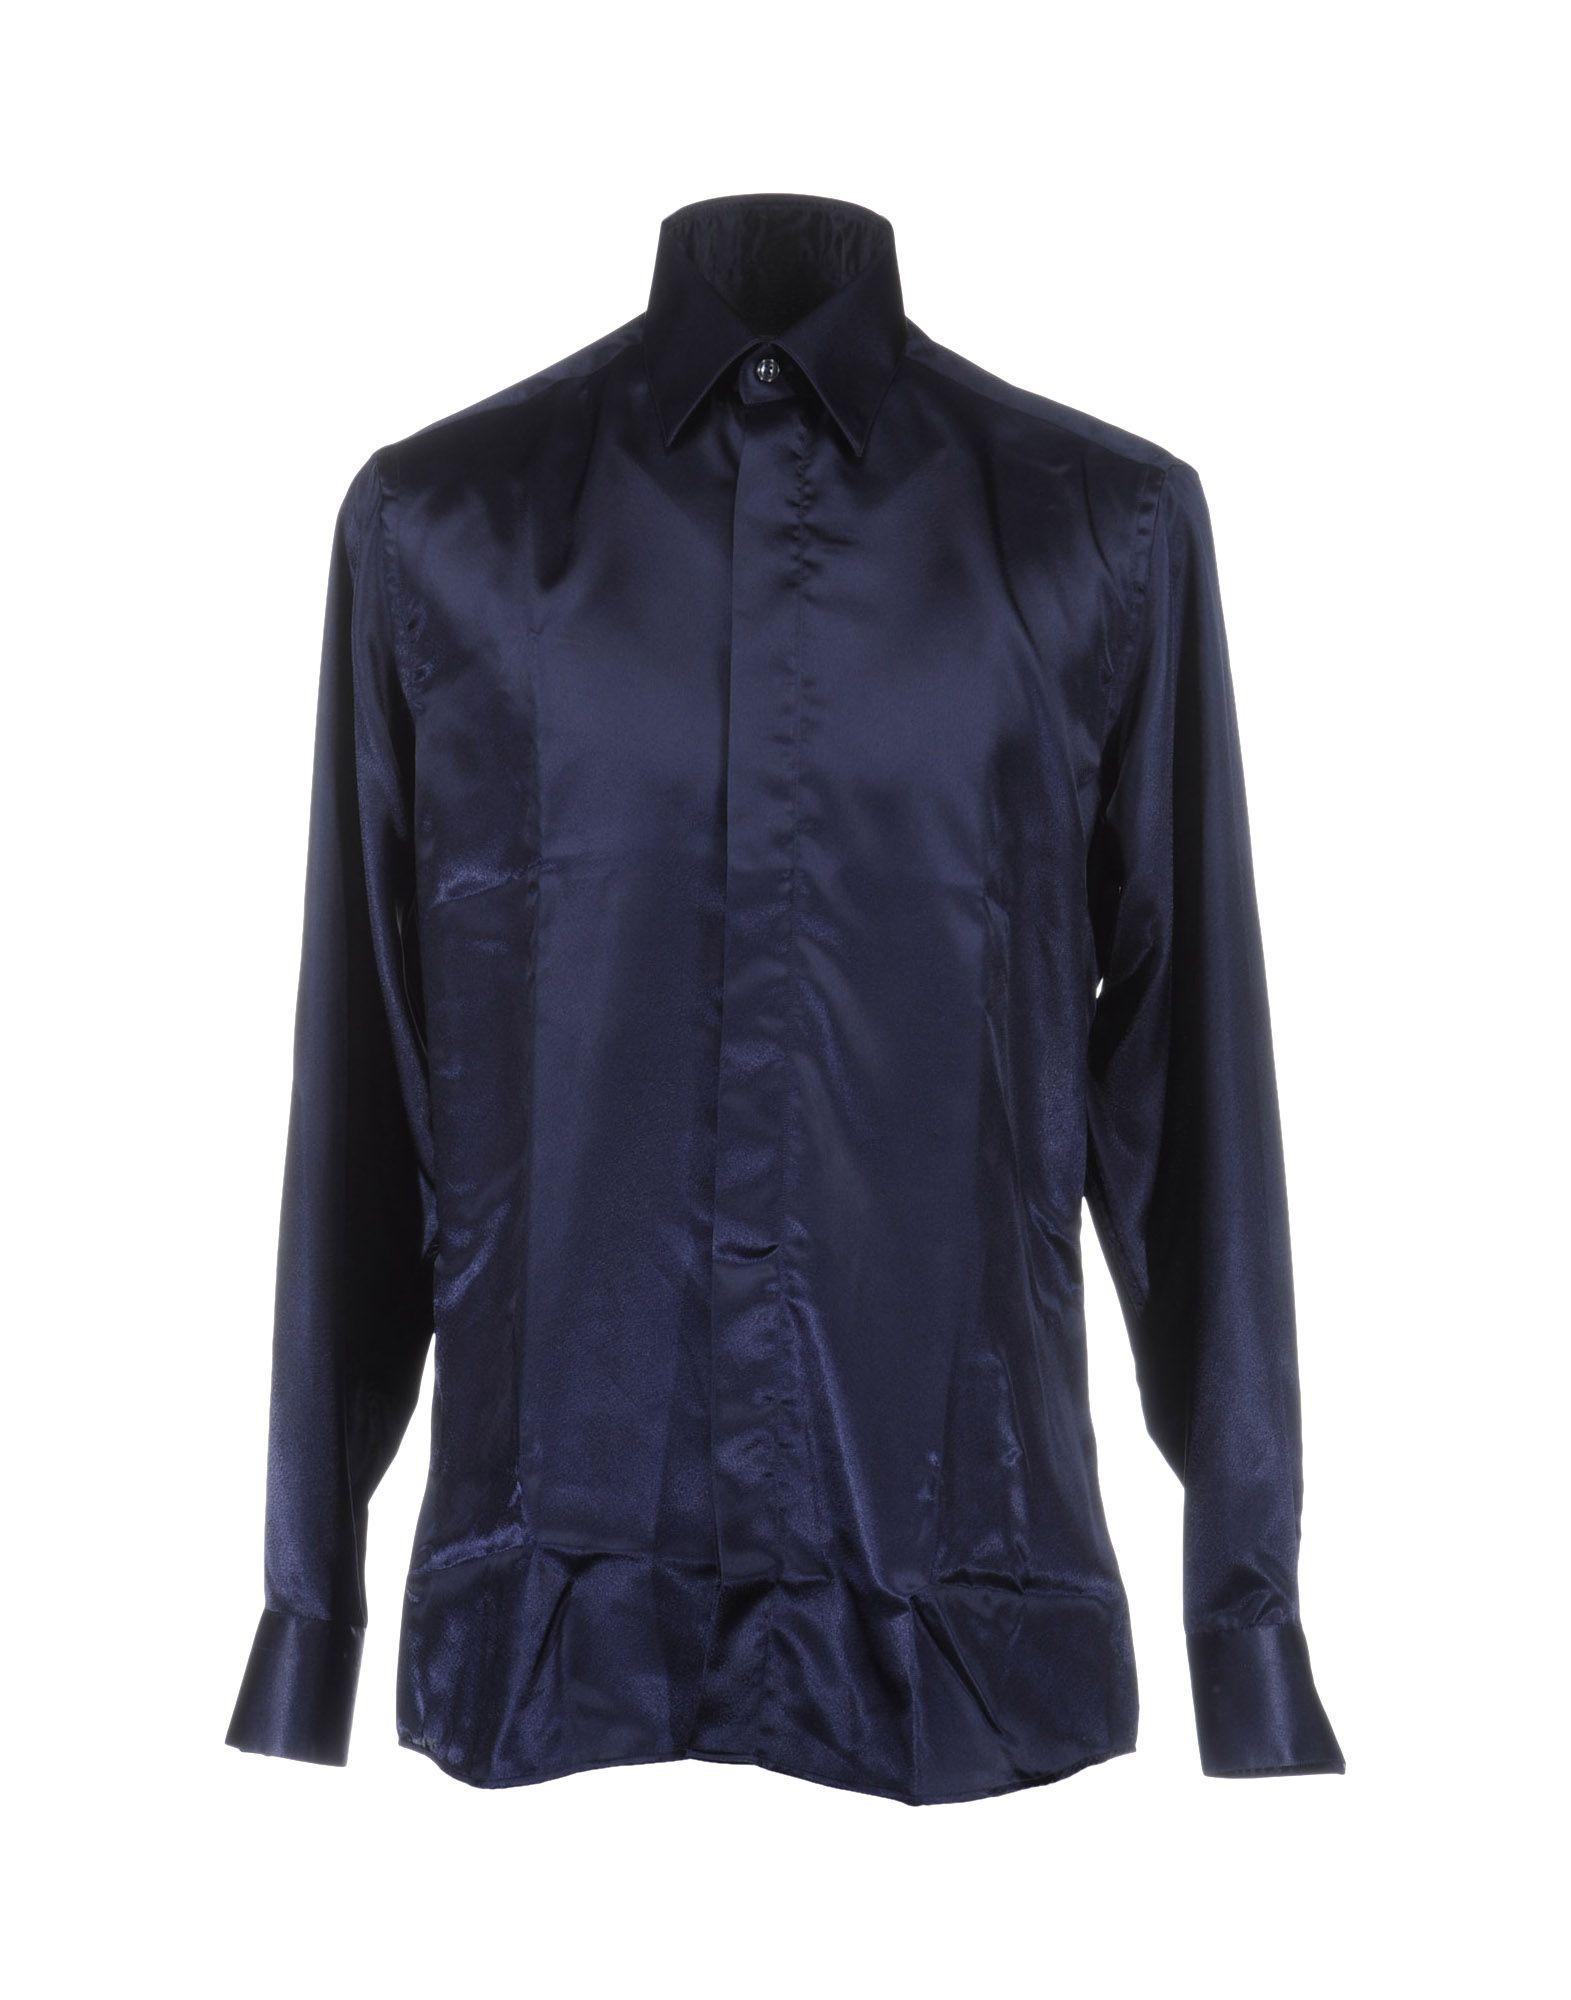 Фото - ARDING & HOBBS Рубашка с длинными рукавами рубашка однотонная с длинными рукавами